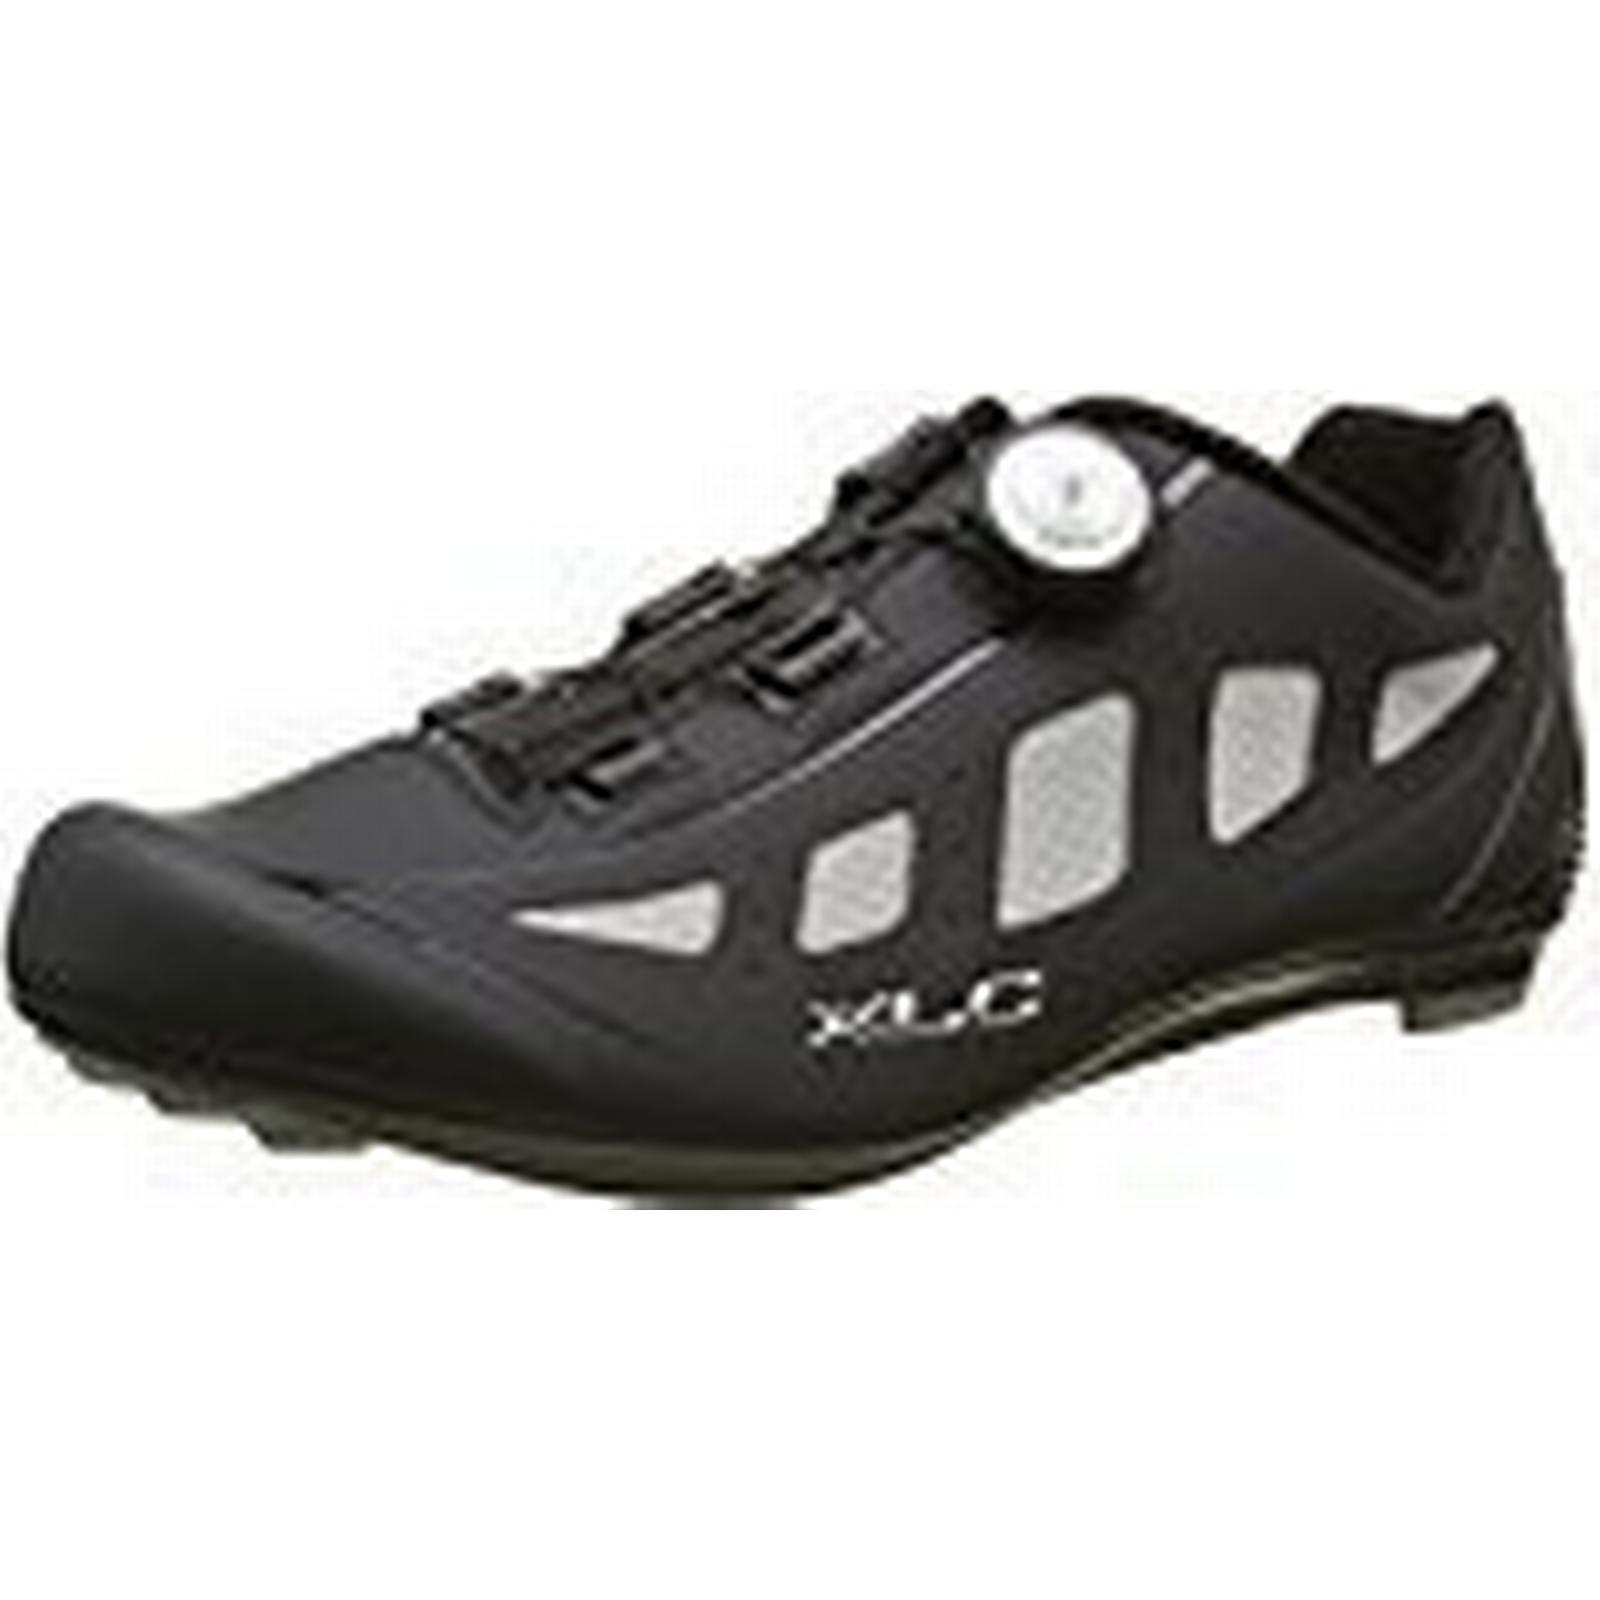 XLC CB Adult Pro Road Size:11 Shoes R06 grey black/grey Size:11 Road 157d38